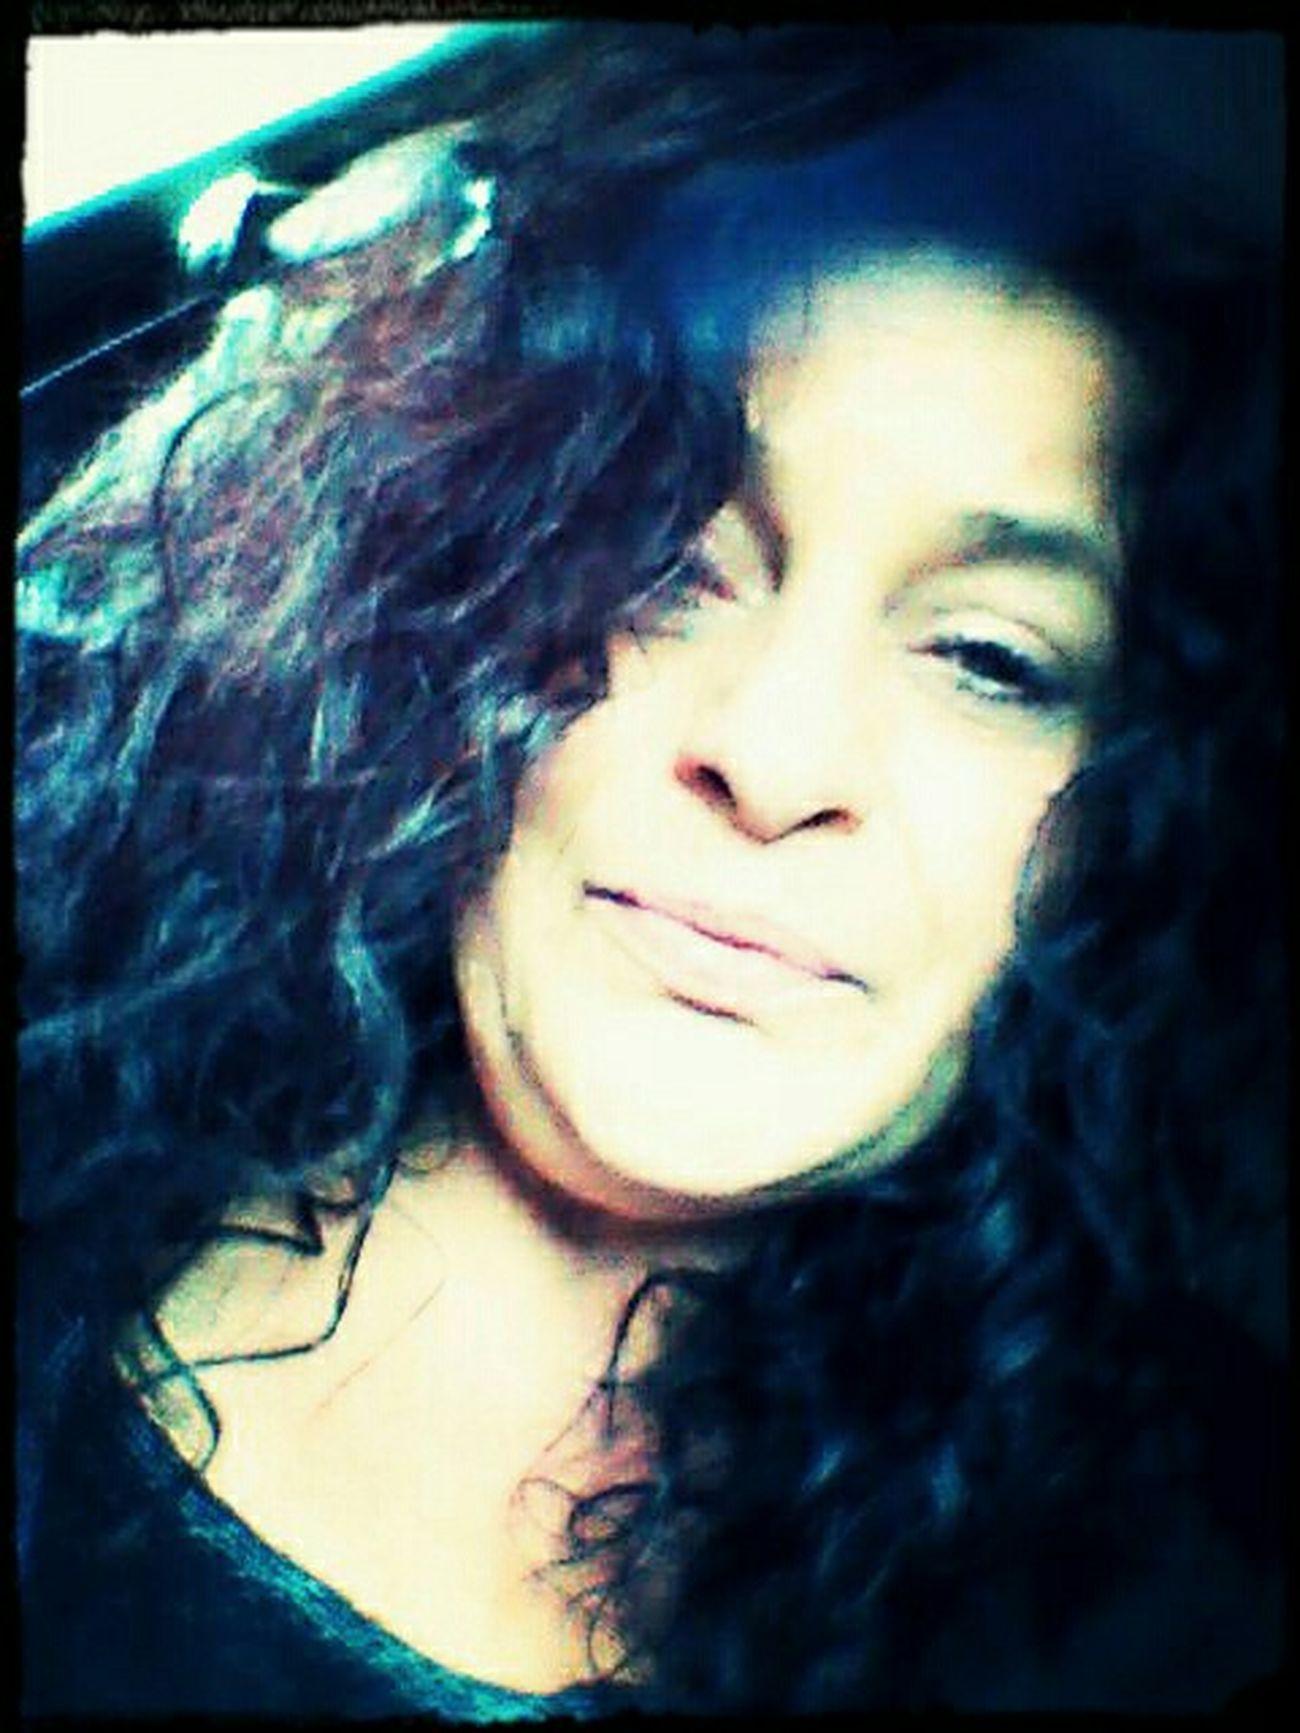 Maggie_Noir Taking Photos Enjoying Life Selfie Black Magic Self Portrait